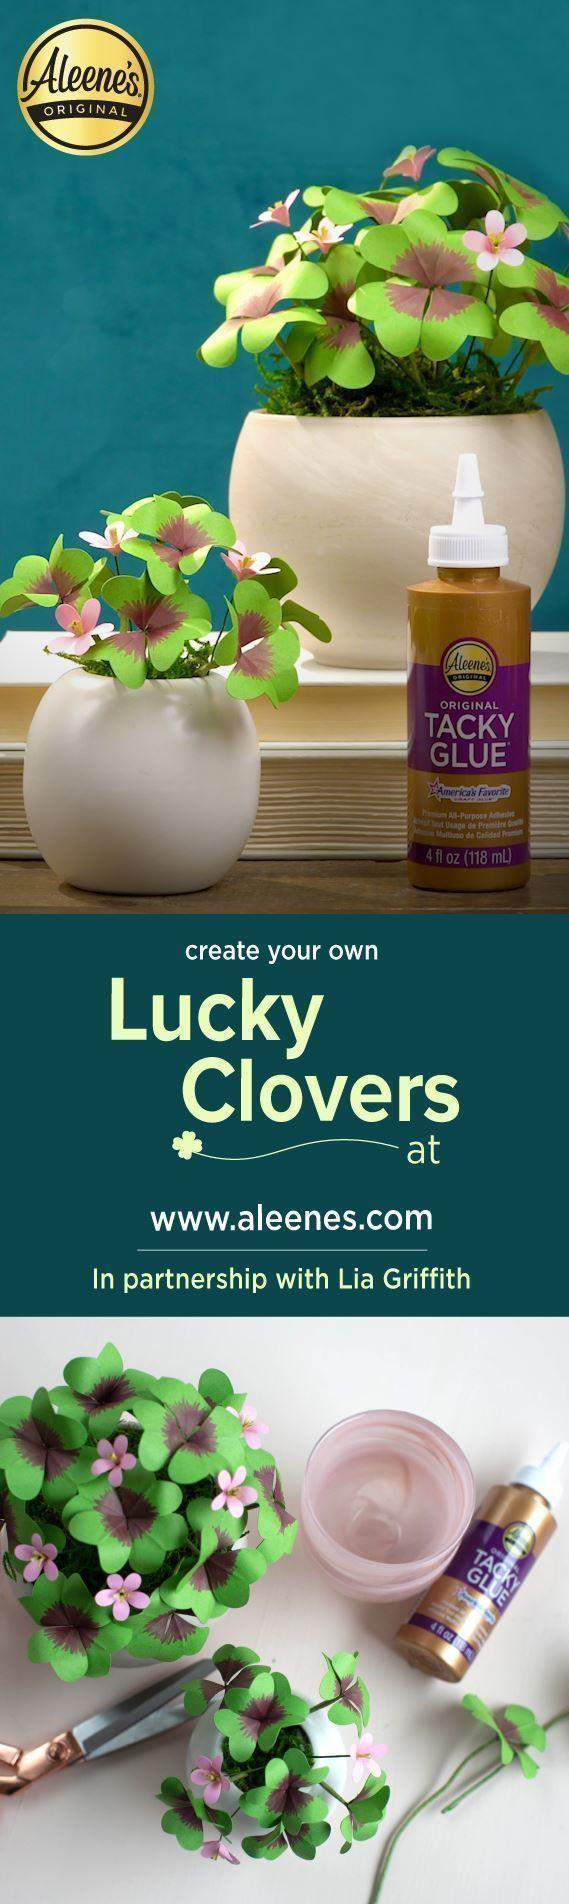 Aleene's Pretty Paper Clovers DIY